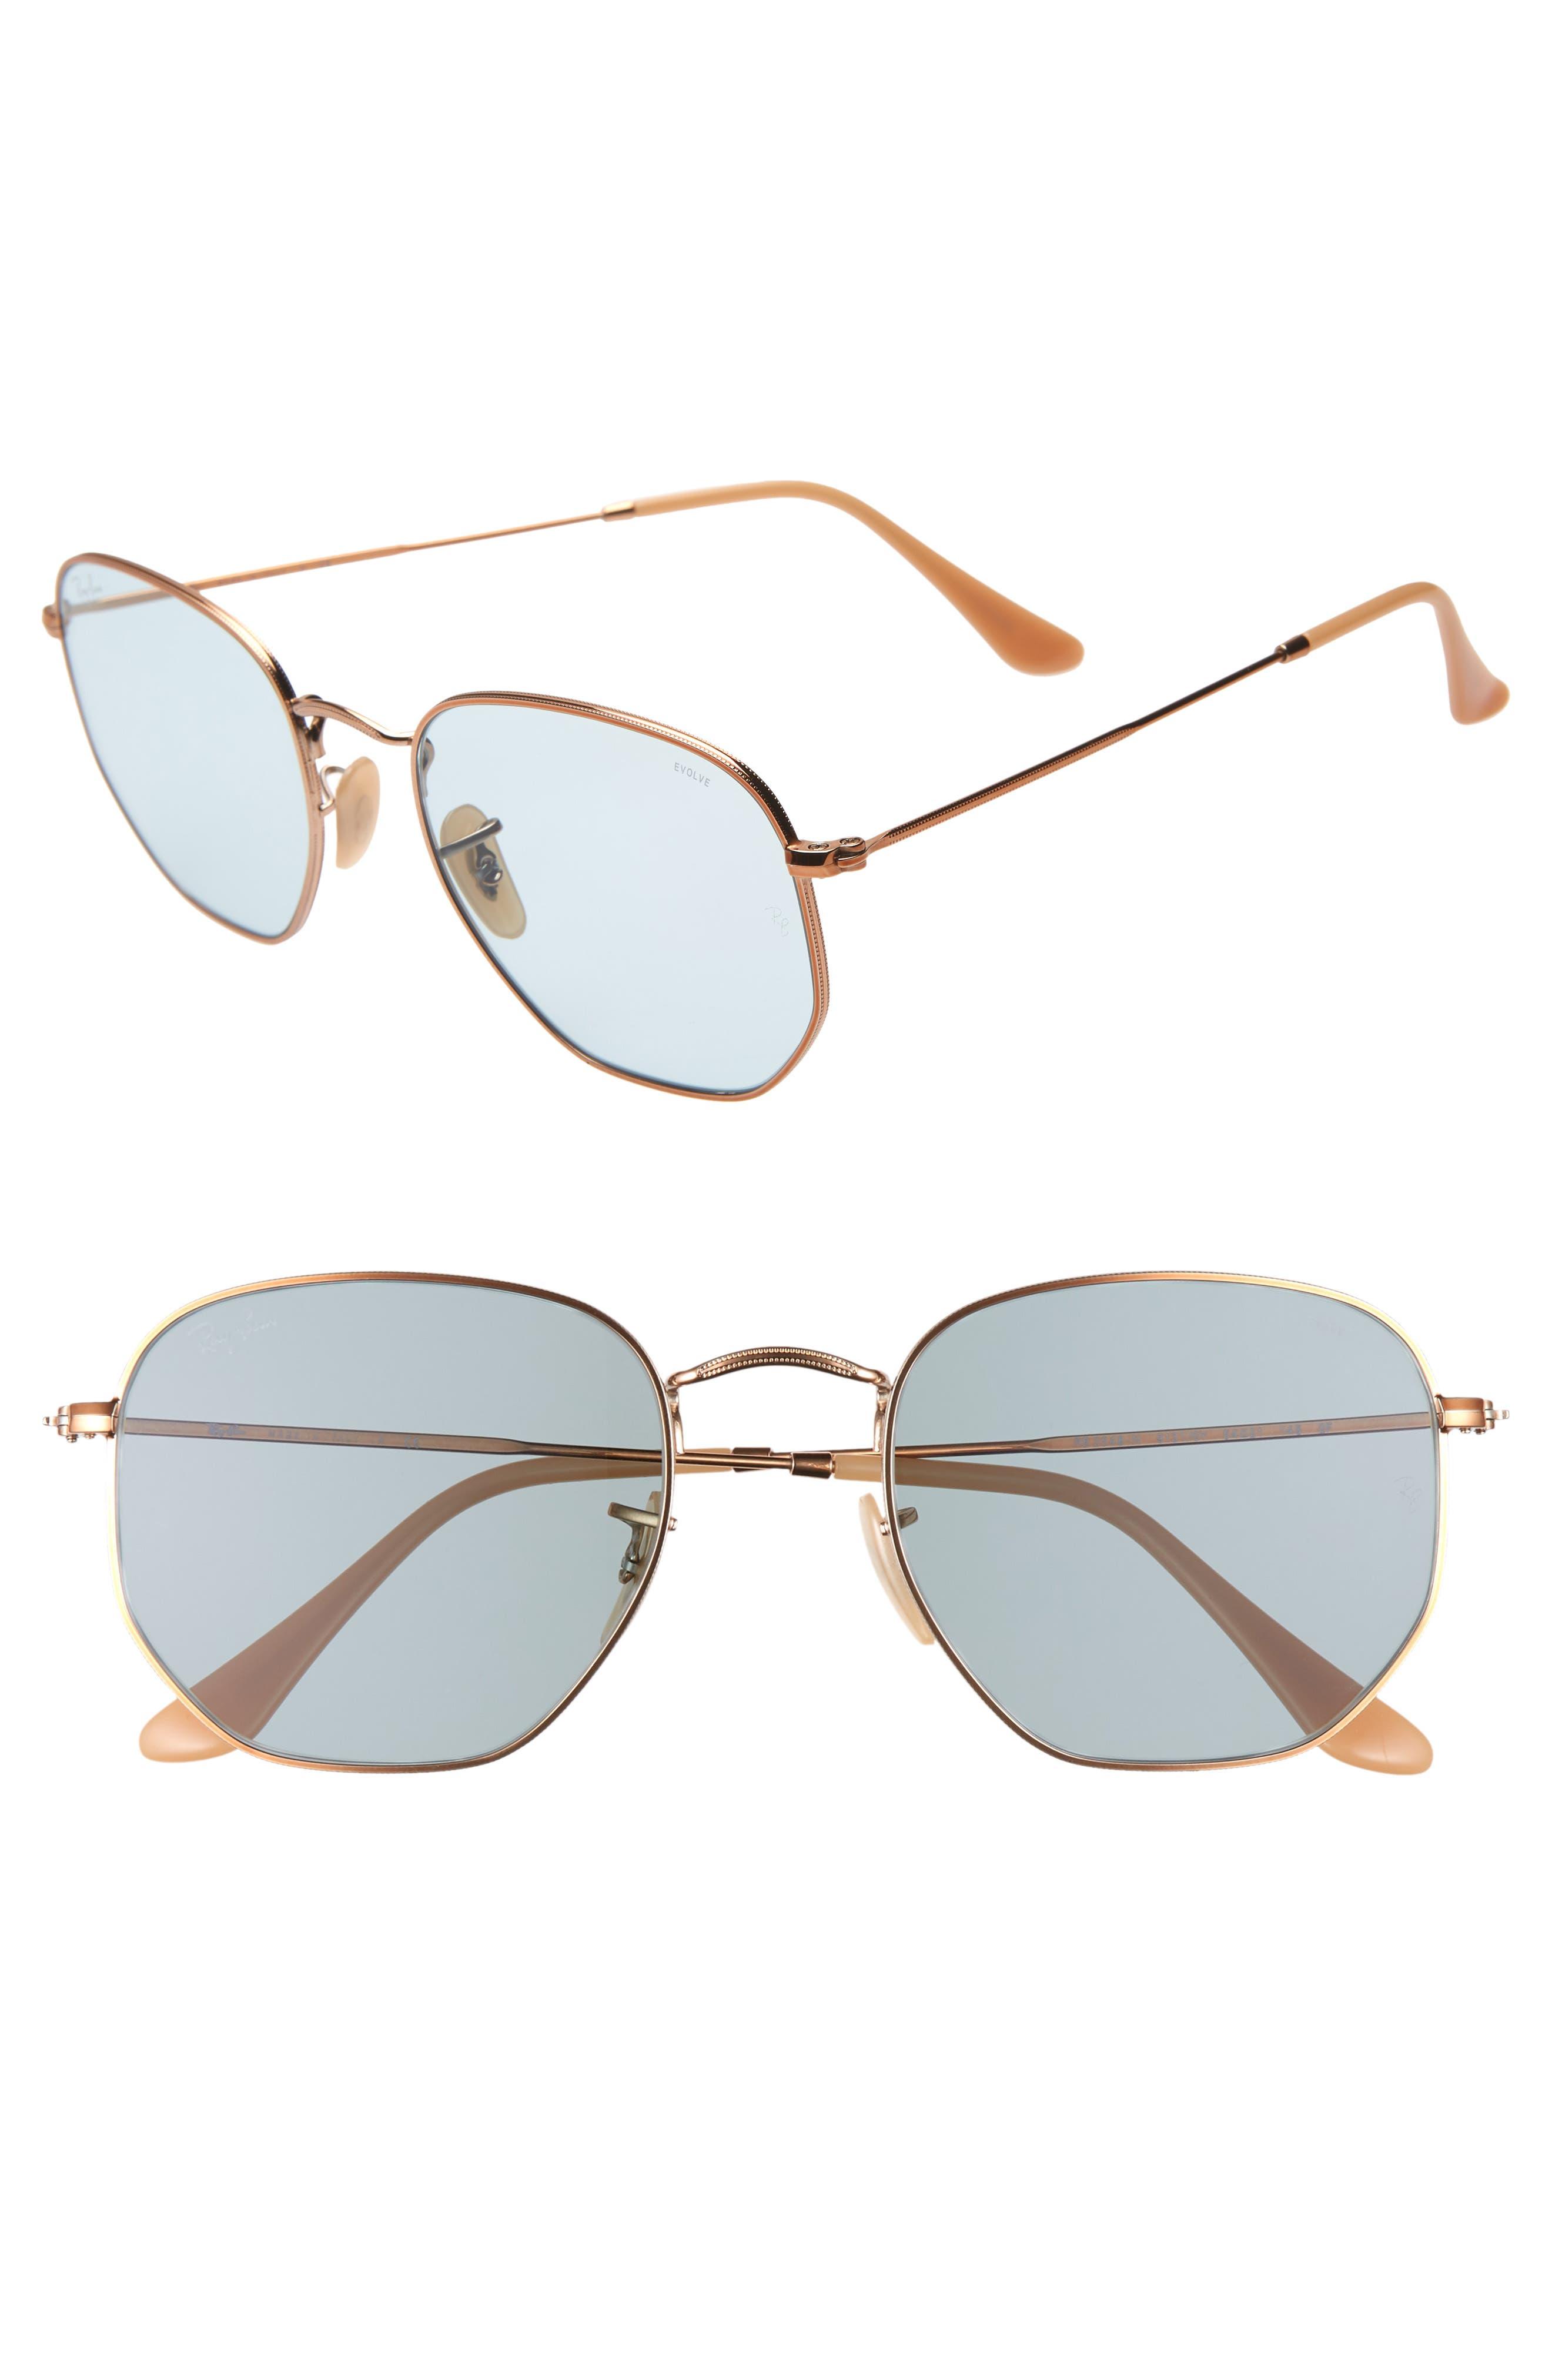 Ray-Ban 5m Evolve Photochromic Hexagon Sunglasses - Gold/ Light Blue Solid